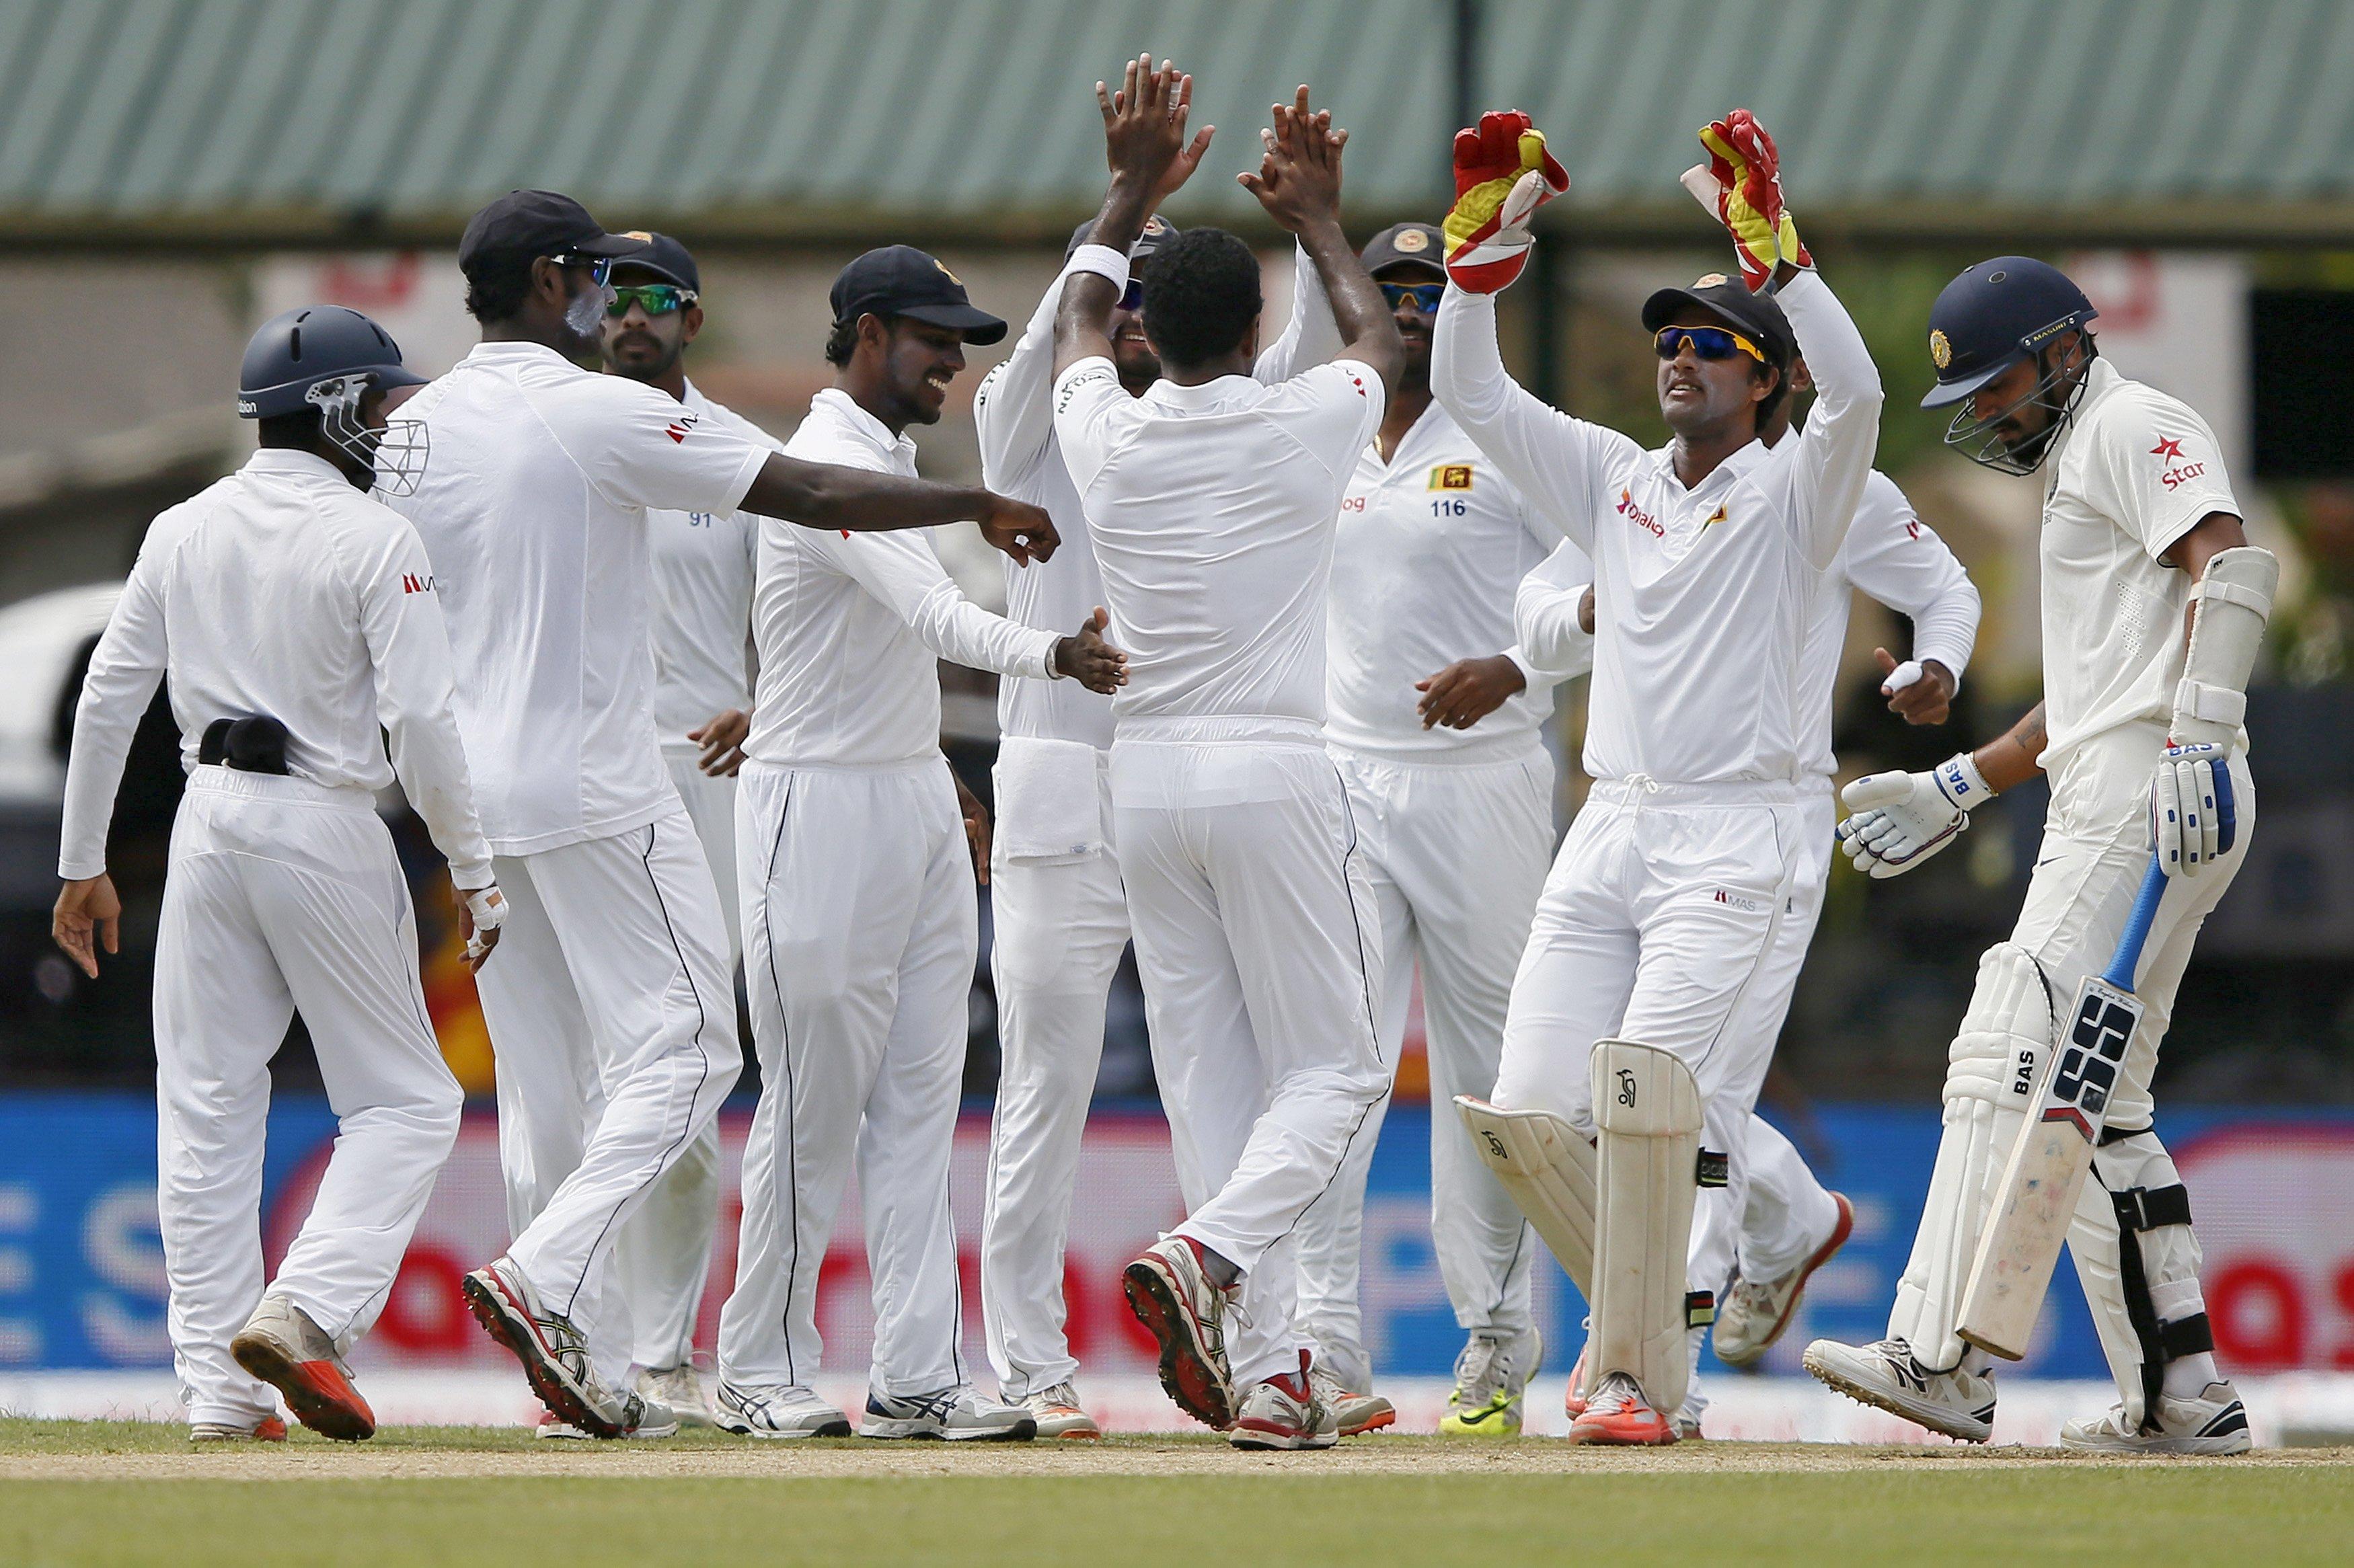 Sri Lanka's captain Angelo Mathews